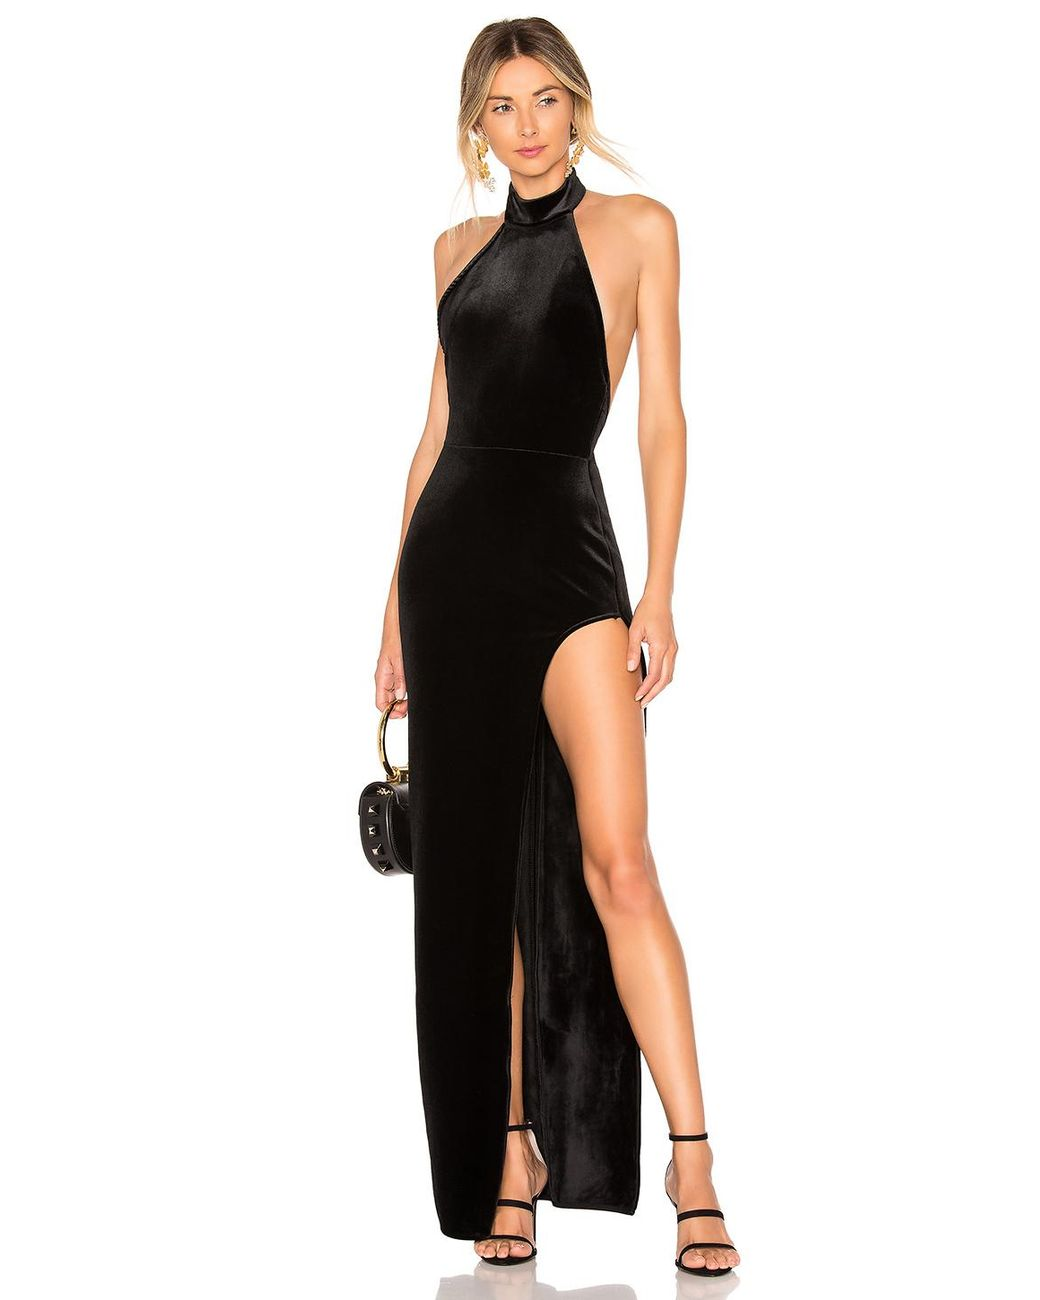 e91bc260313ac Michael Costello X Revolve Penelope Gown in Black - Lyst